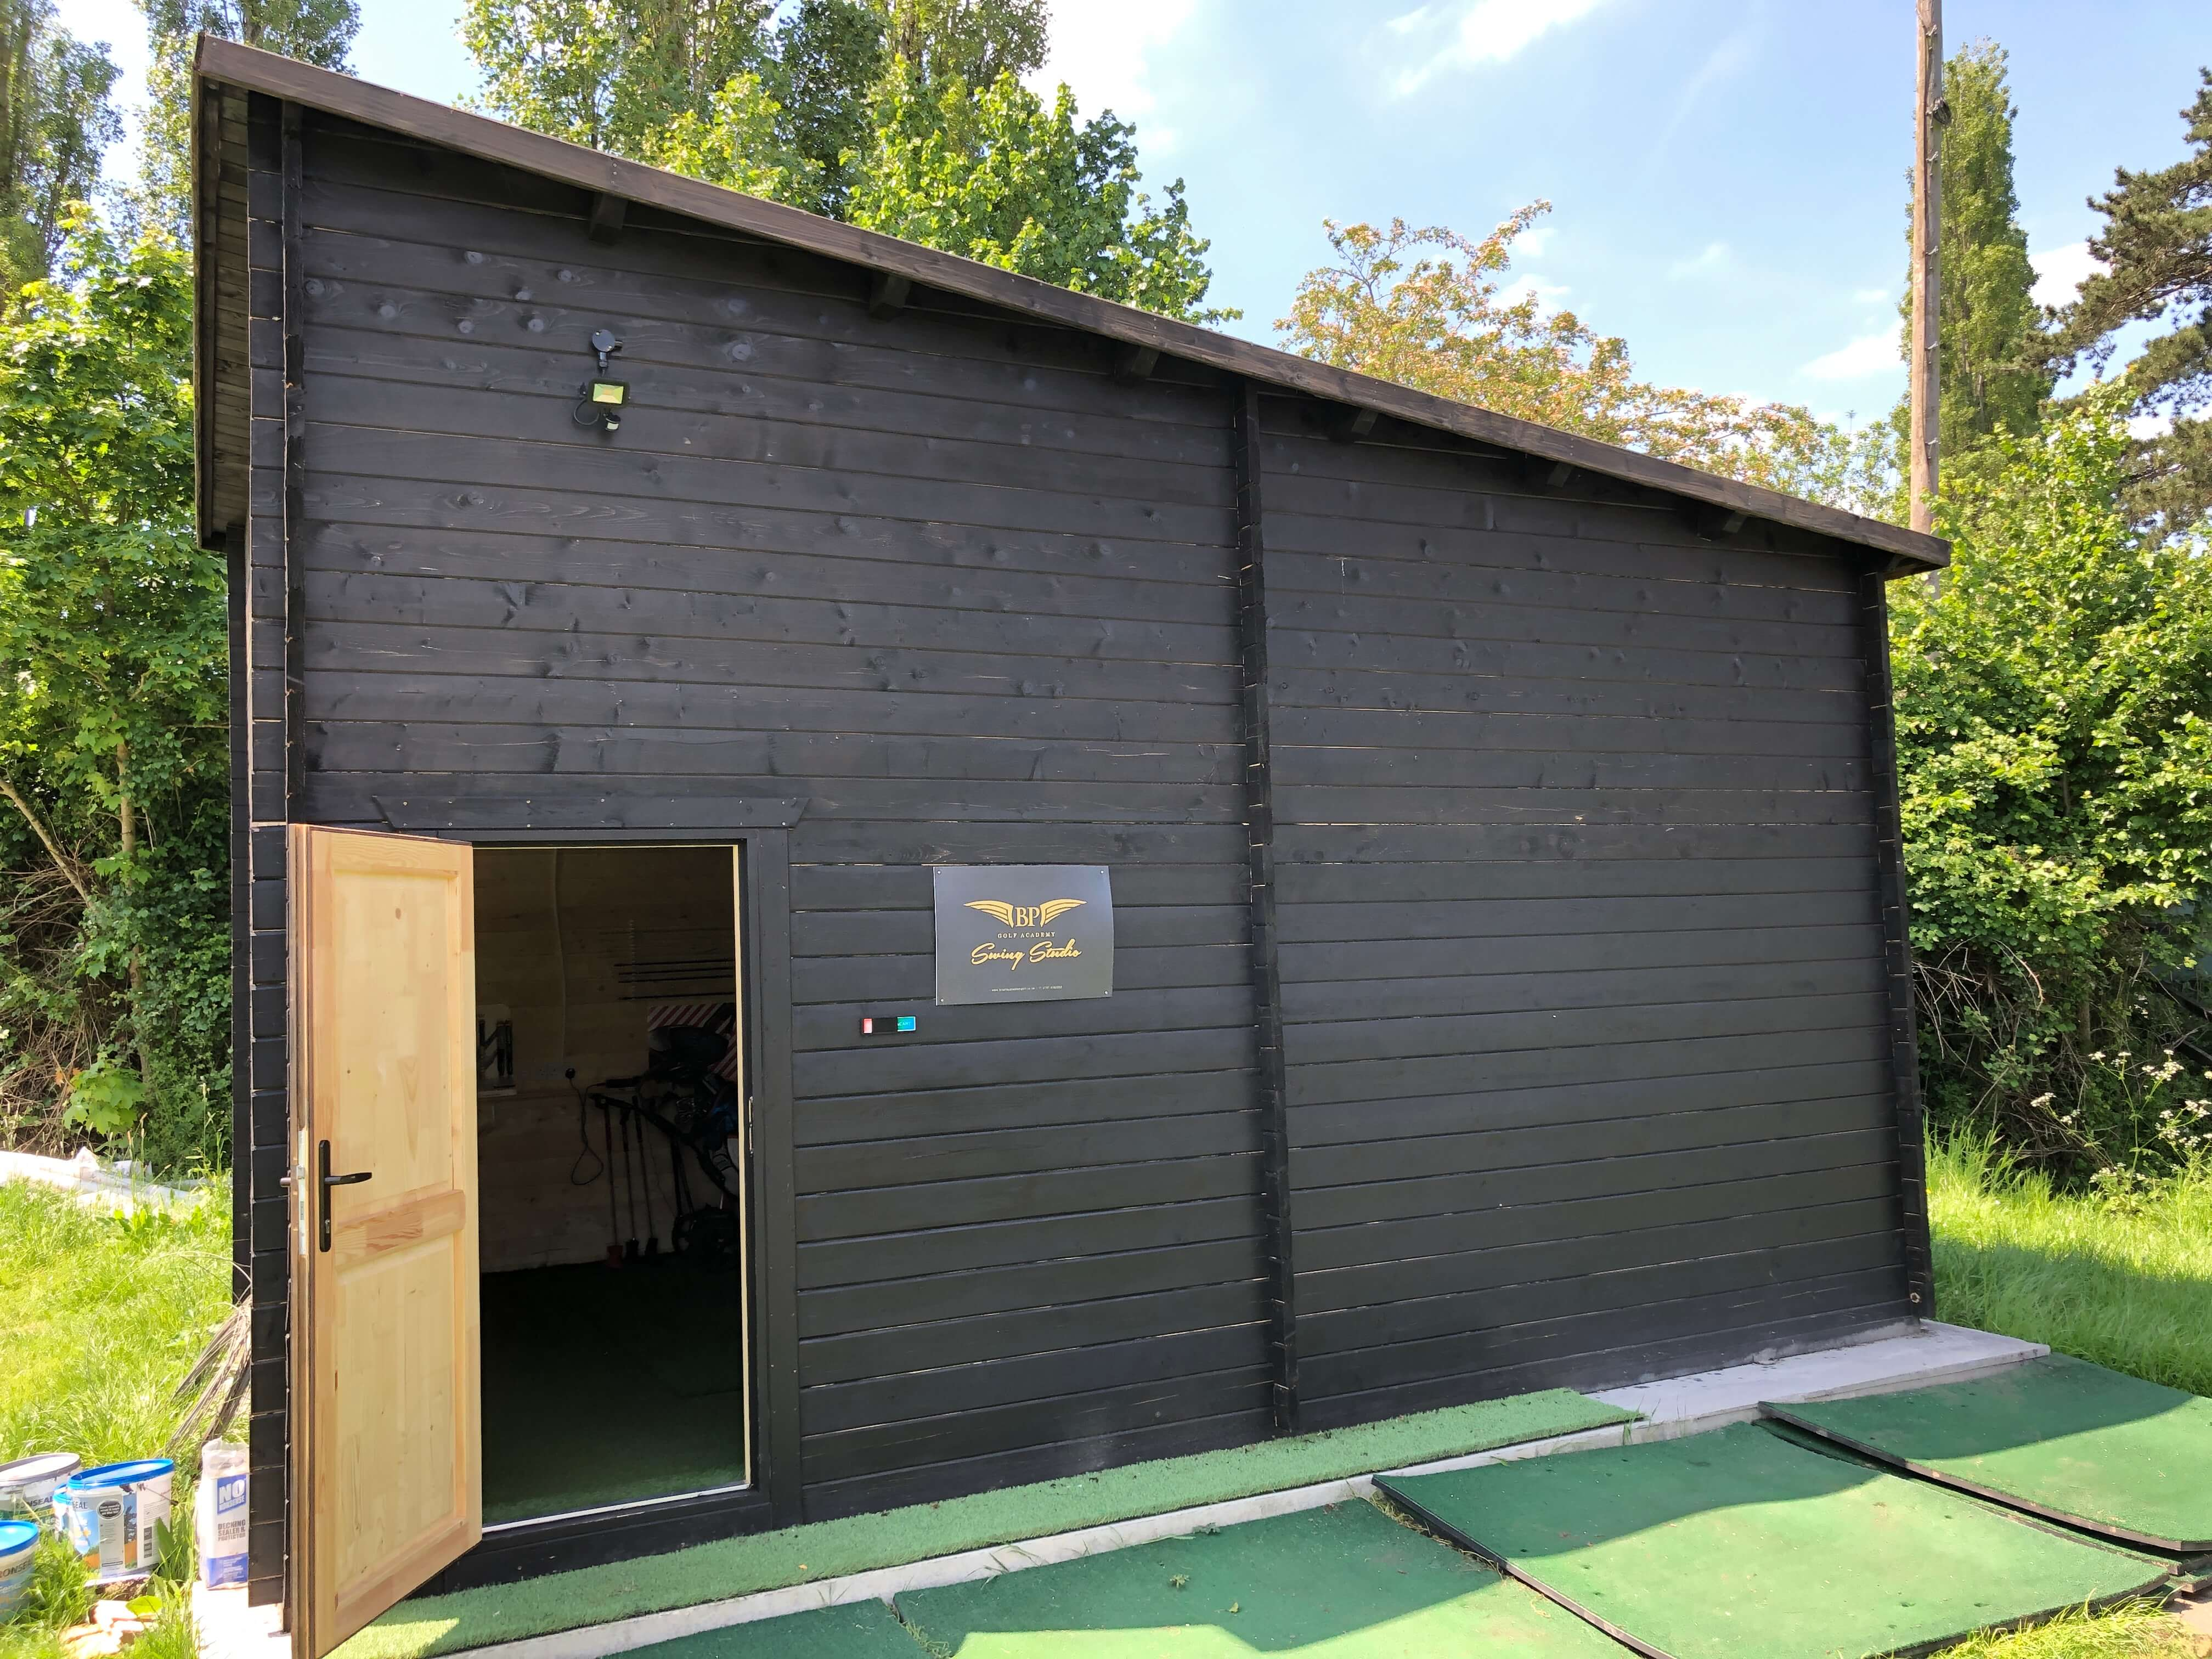 The Bradley Preston Golf Studio at Epping Golf Club